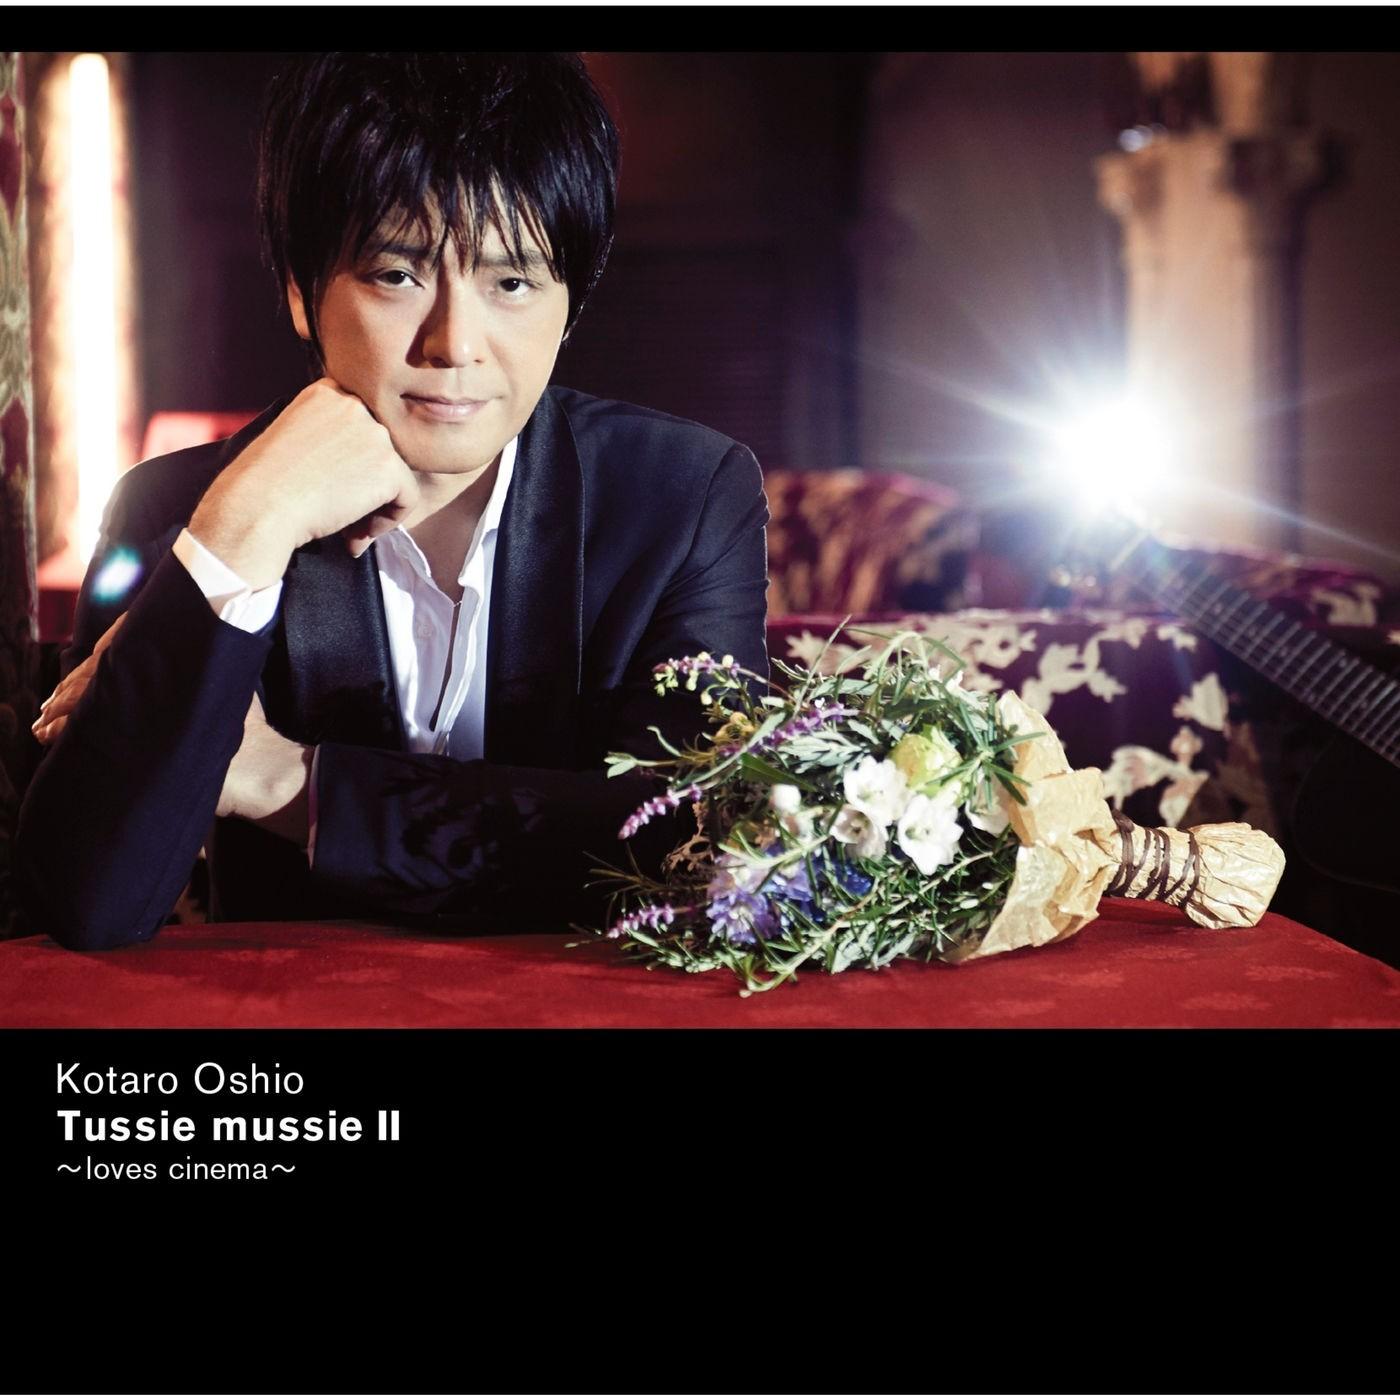 [Album] 押尾コータロー (Kotaro Oshio) – Tussie mussie II 〜loves cinema〜 [FLAC / 24bit Lossless / WEB] [2015…